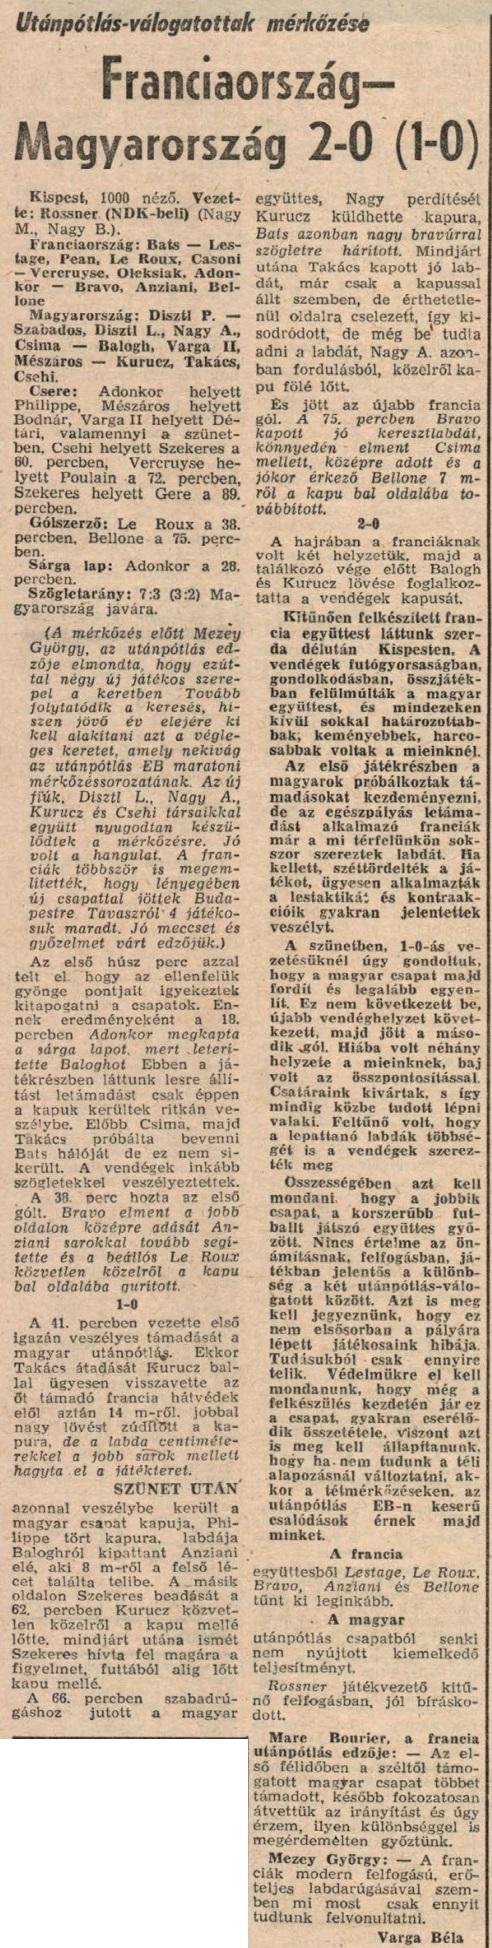 idokapszula_nb_i_1982_83_franciaorszag_magyarorszag_u21_2.jpg